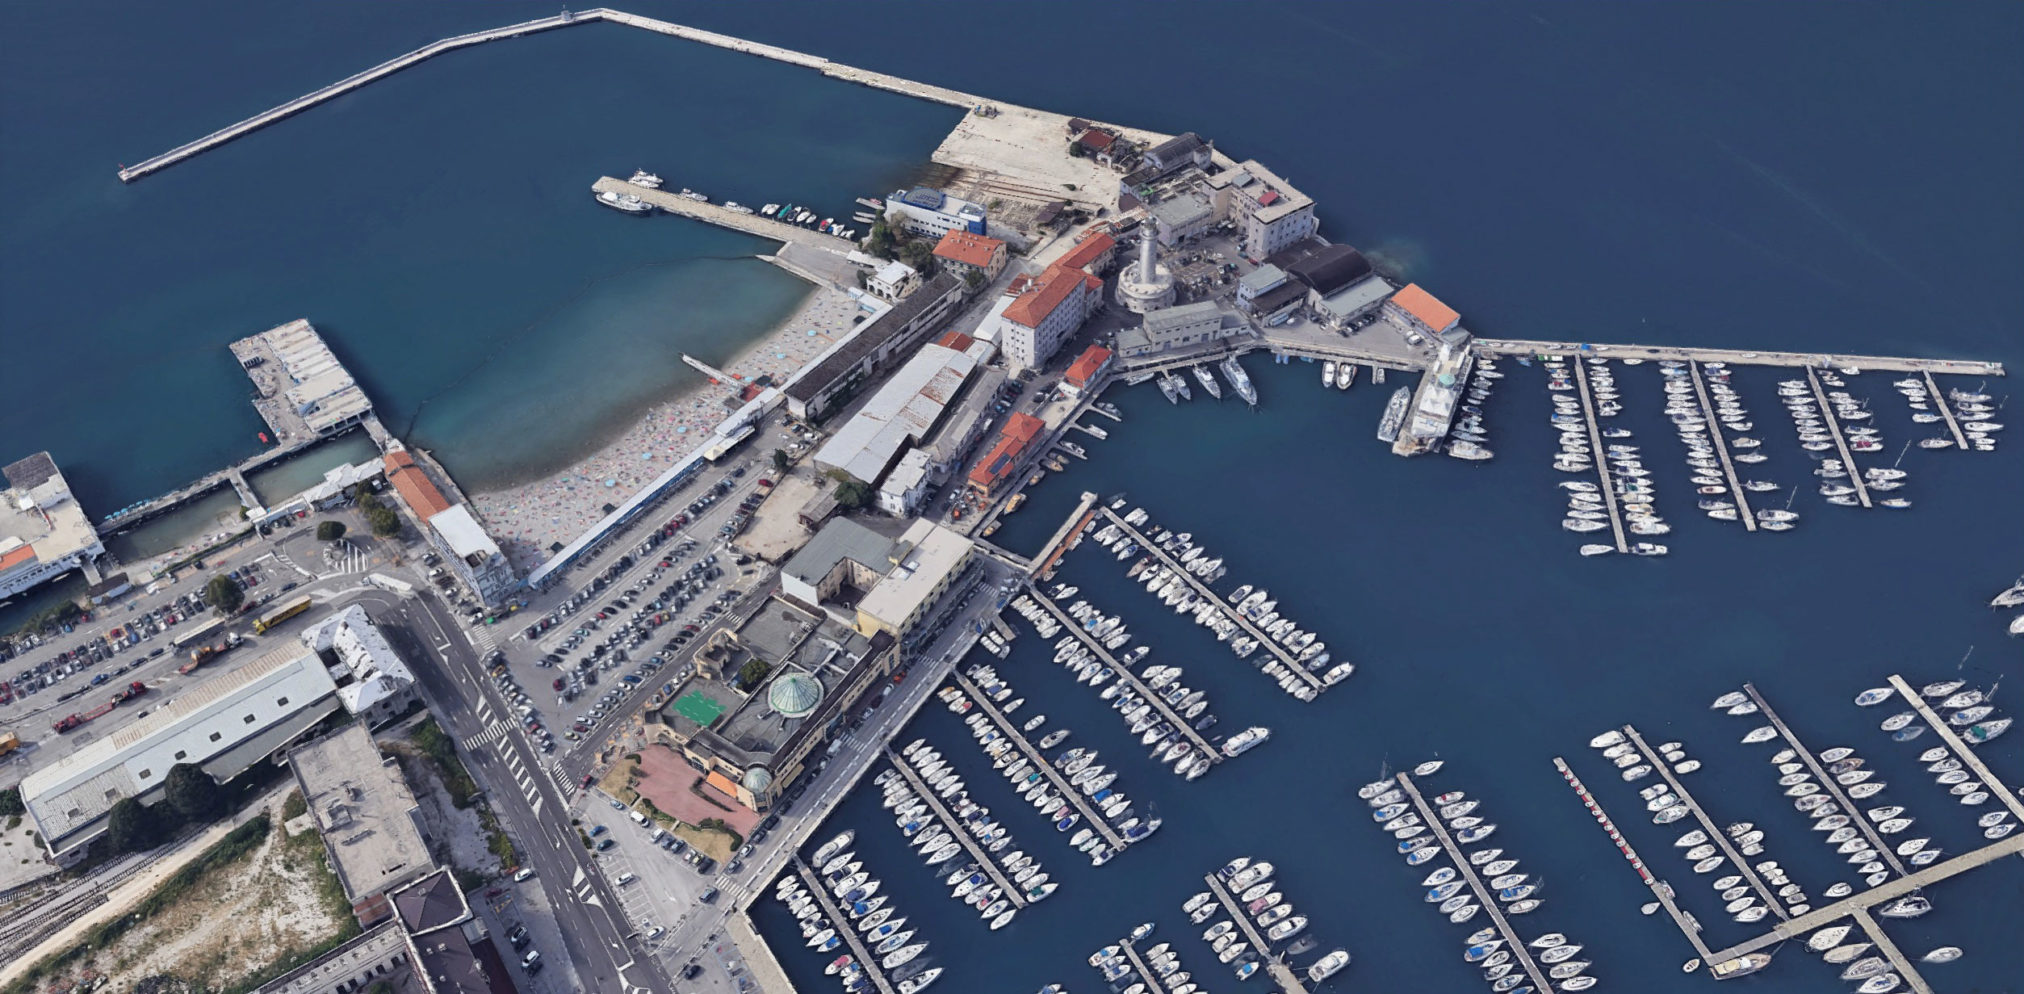 Campo Marzio Pedocin Lanterna Trieste